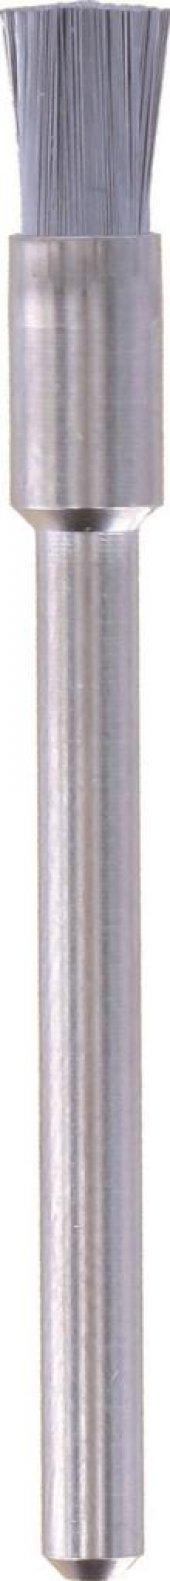 Dremel Karbon Çelik Fırça 3,2 Mm (443) (3 Adet)